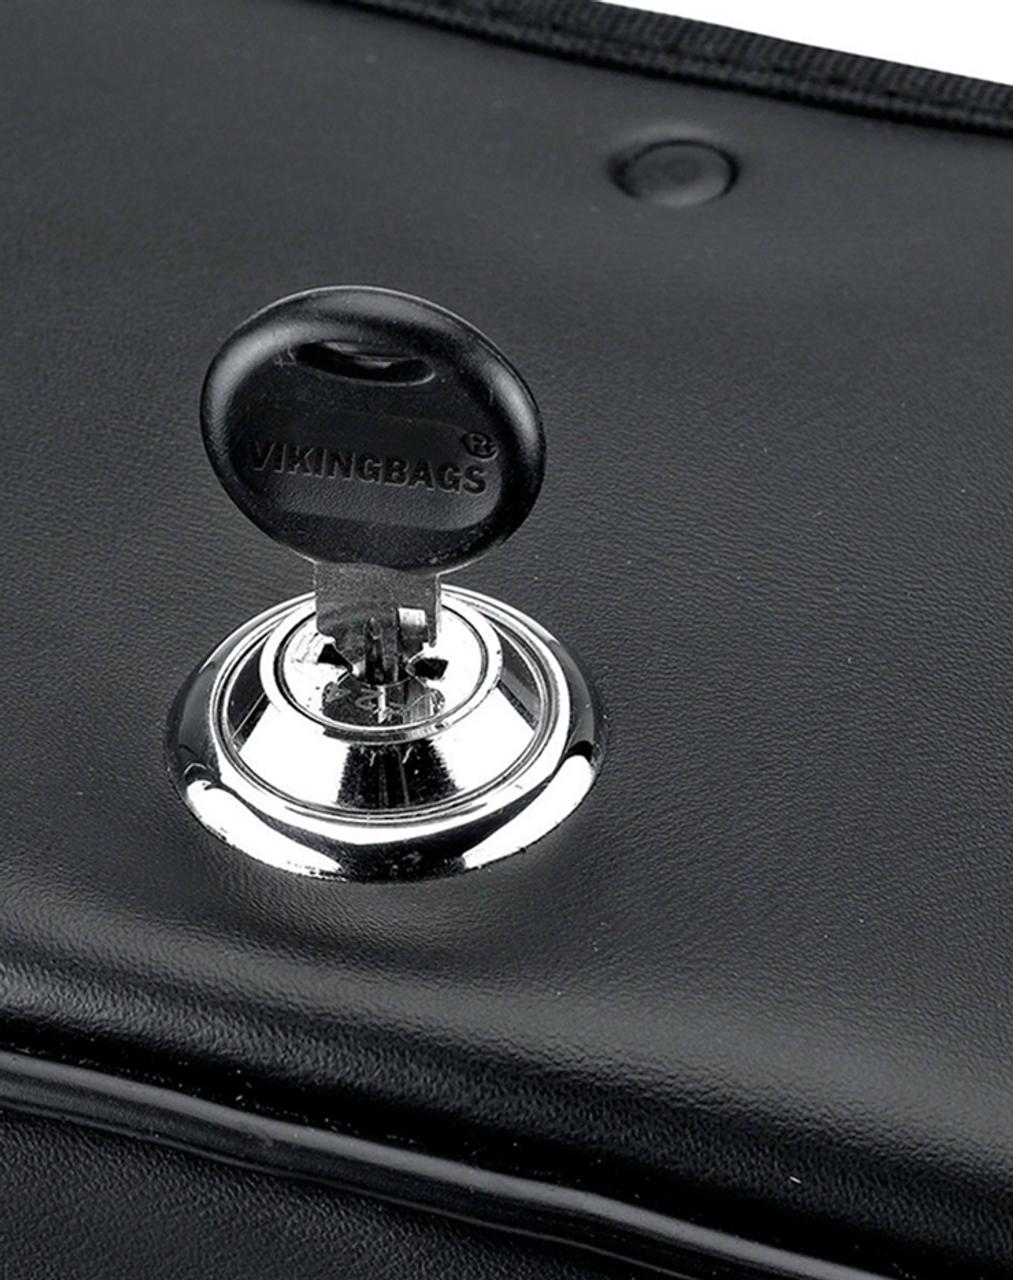 Triumph Rocket III Range Charger Single Strap Studded Large Motorcycle Saddlebags Key Lock View